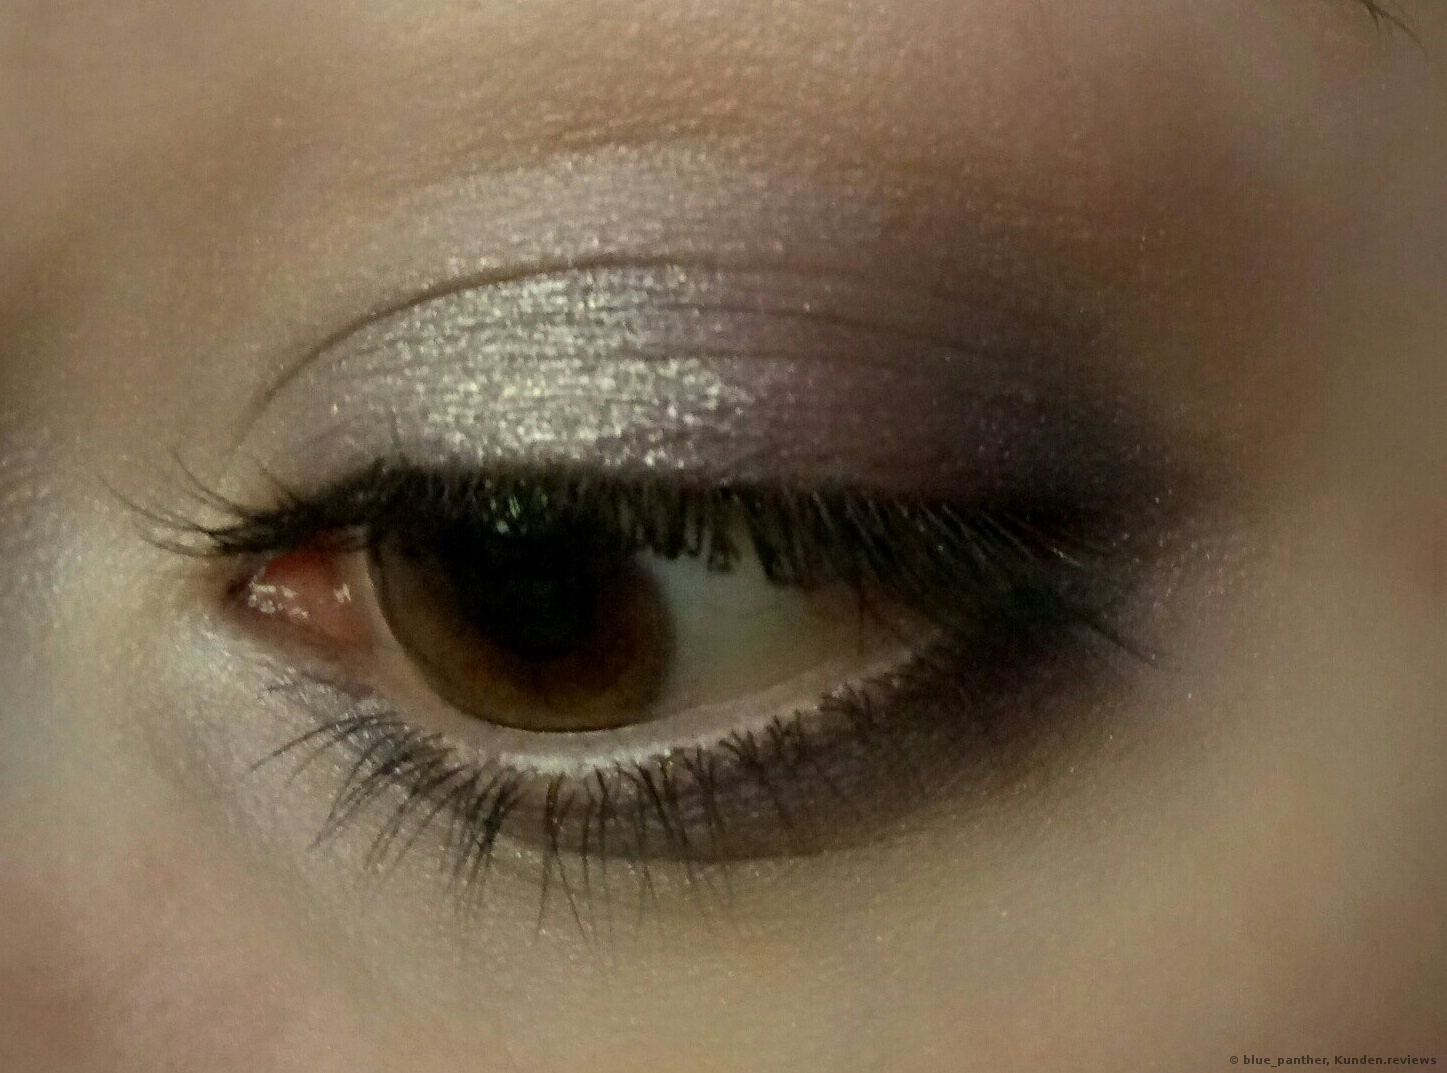 Mit dem Catrice  Metal Longlasting Cream Eyeshadow im inneren Augenwinkel